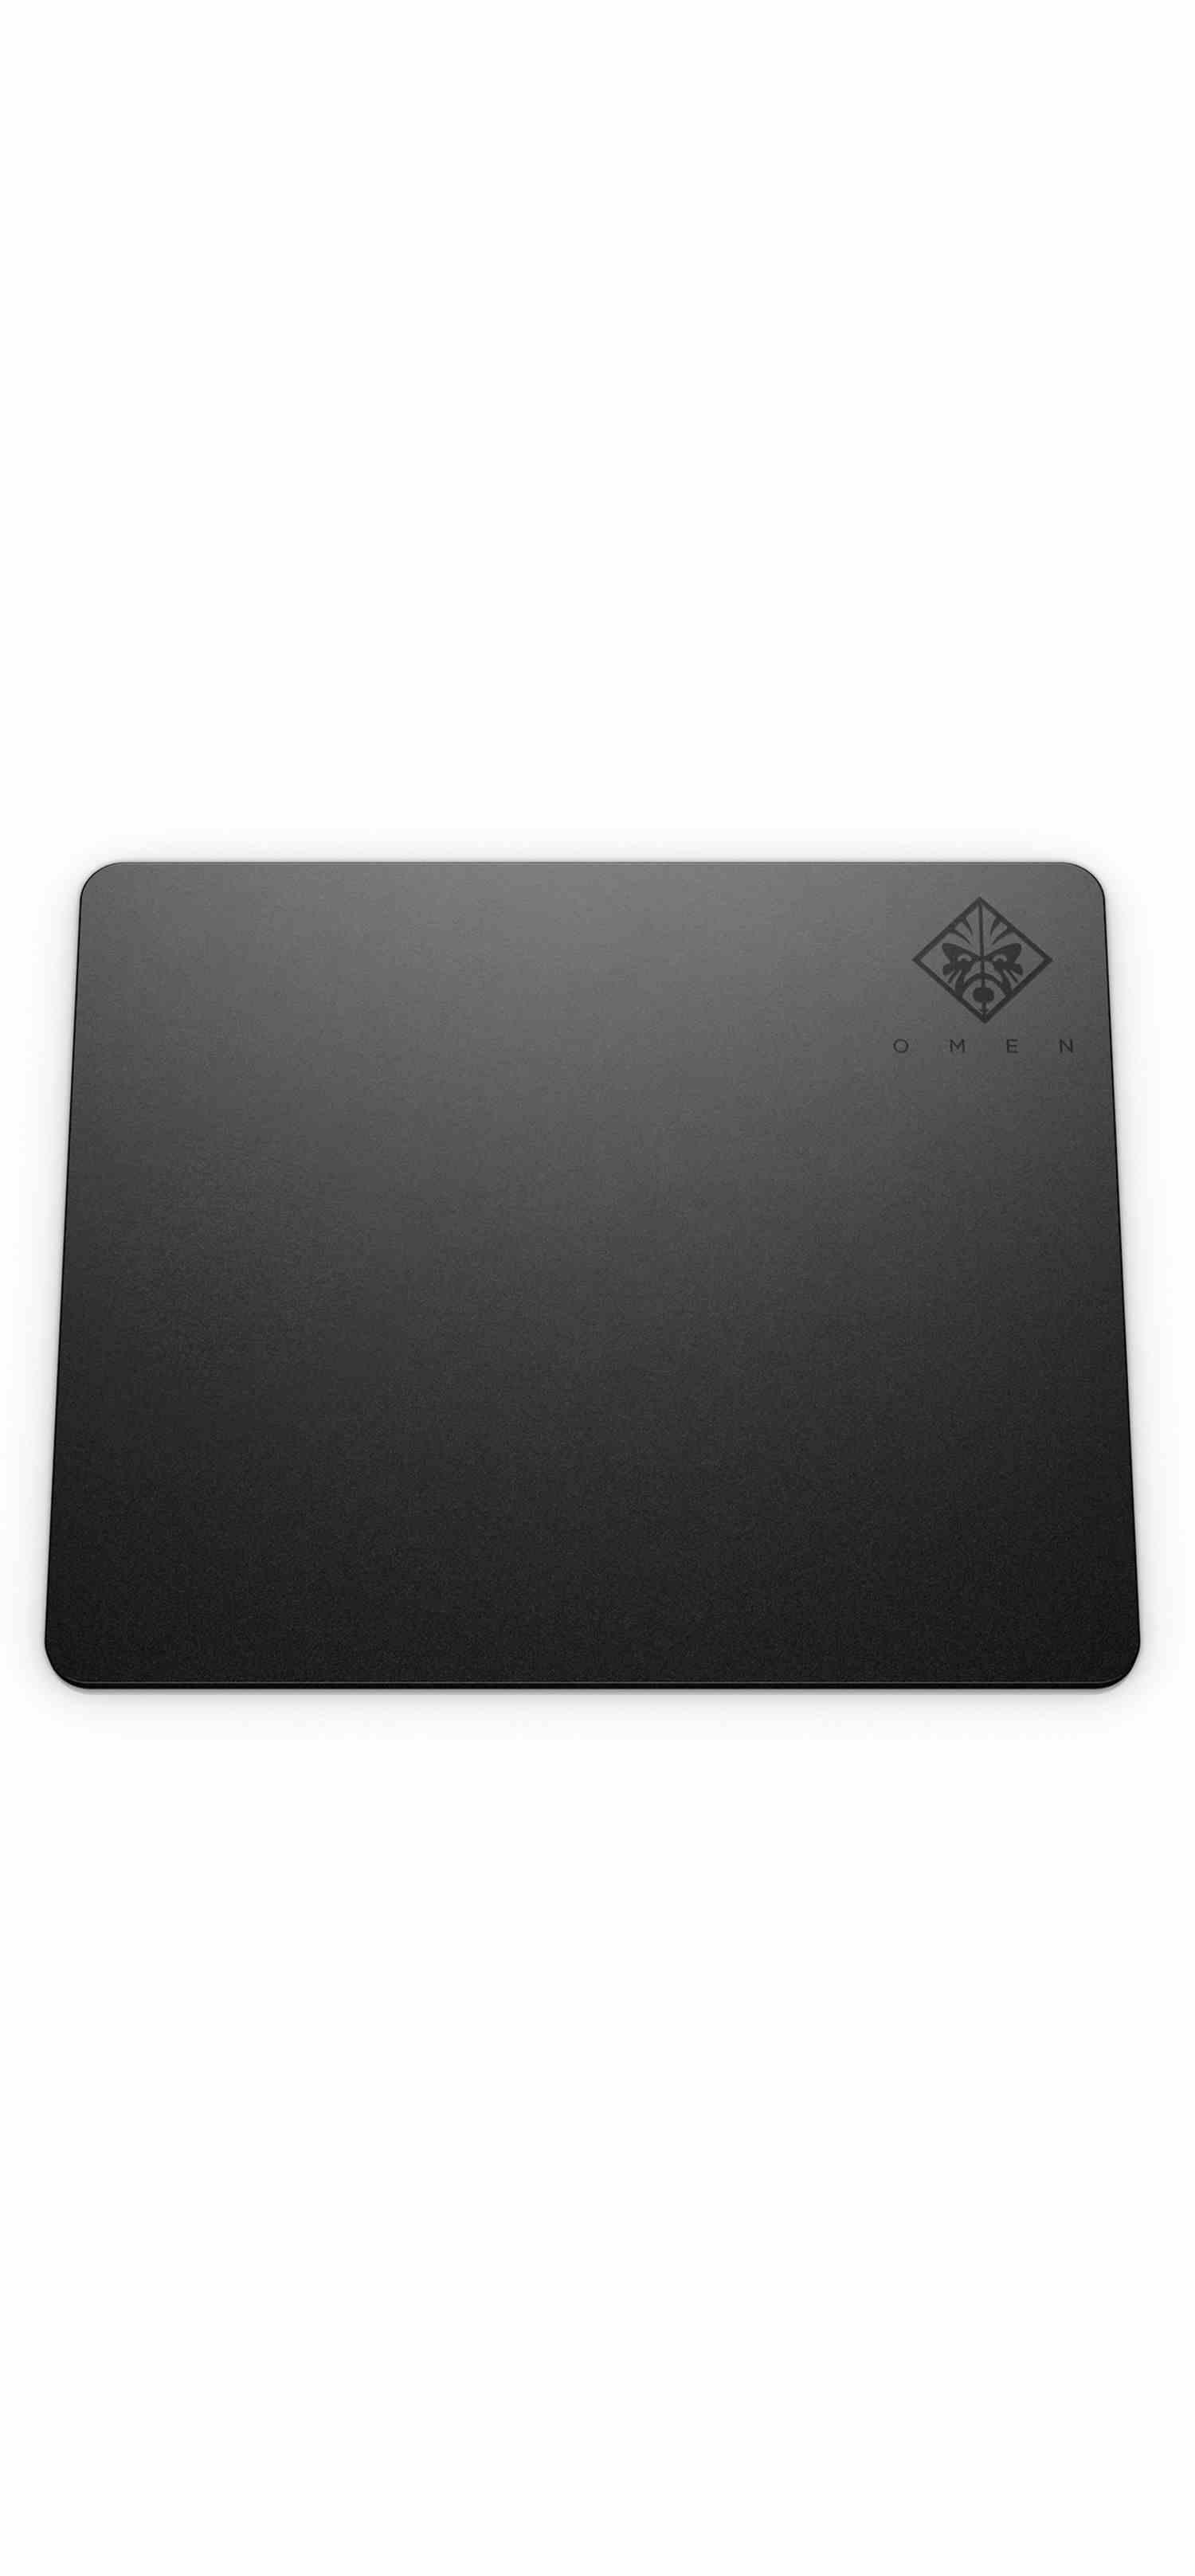 HP OMEN 100 Mouse Pad - MOUSEPAD (1MY14AA#ABB)